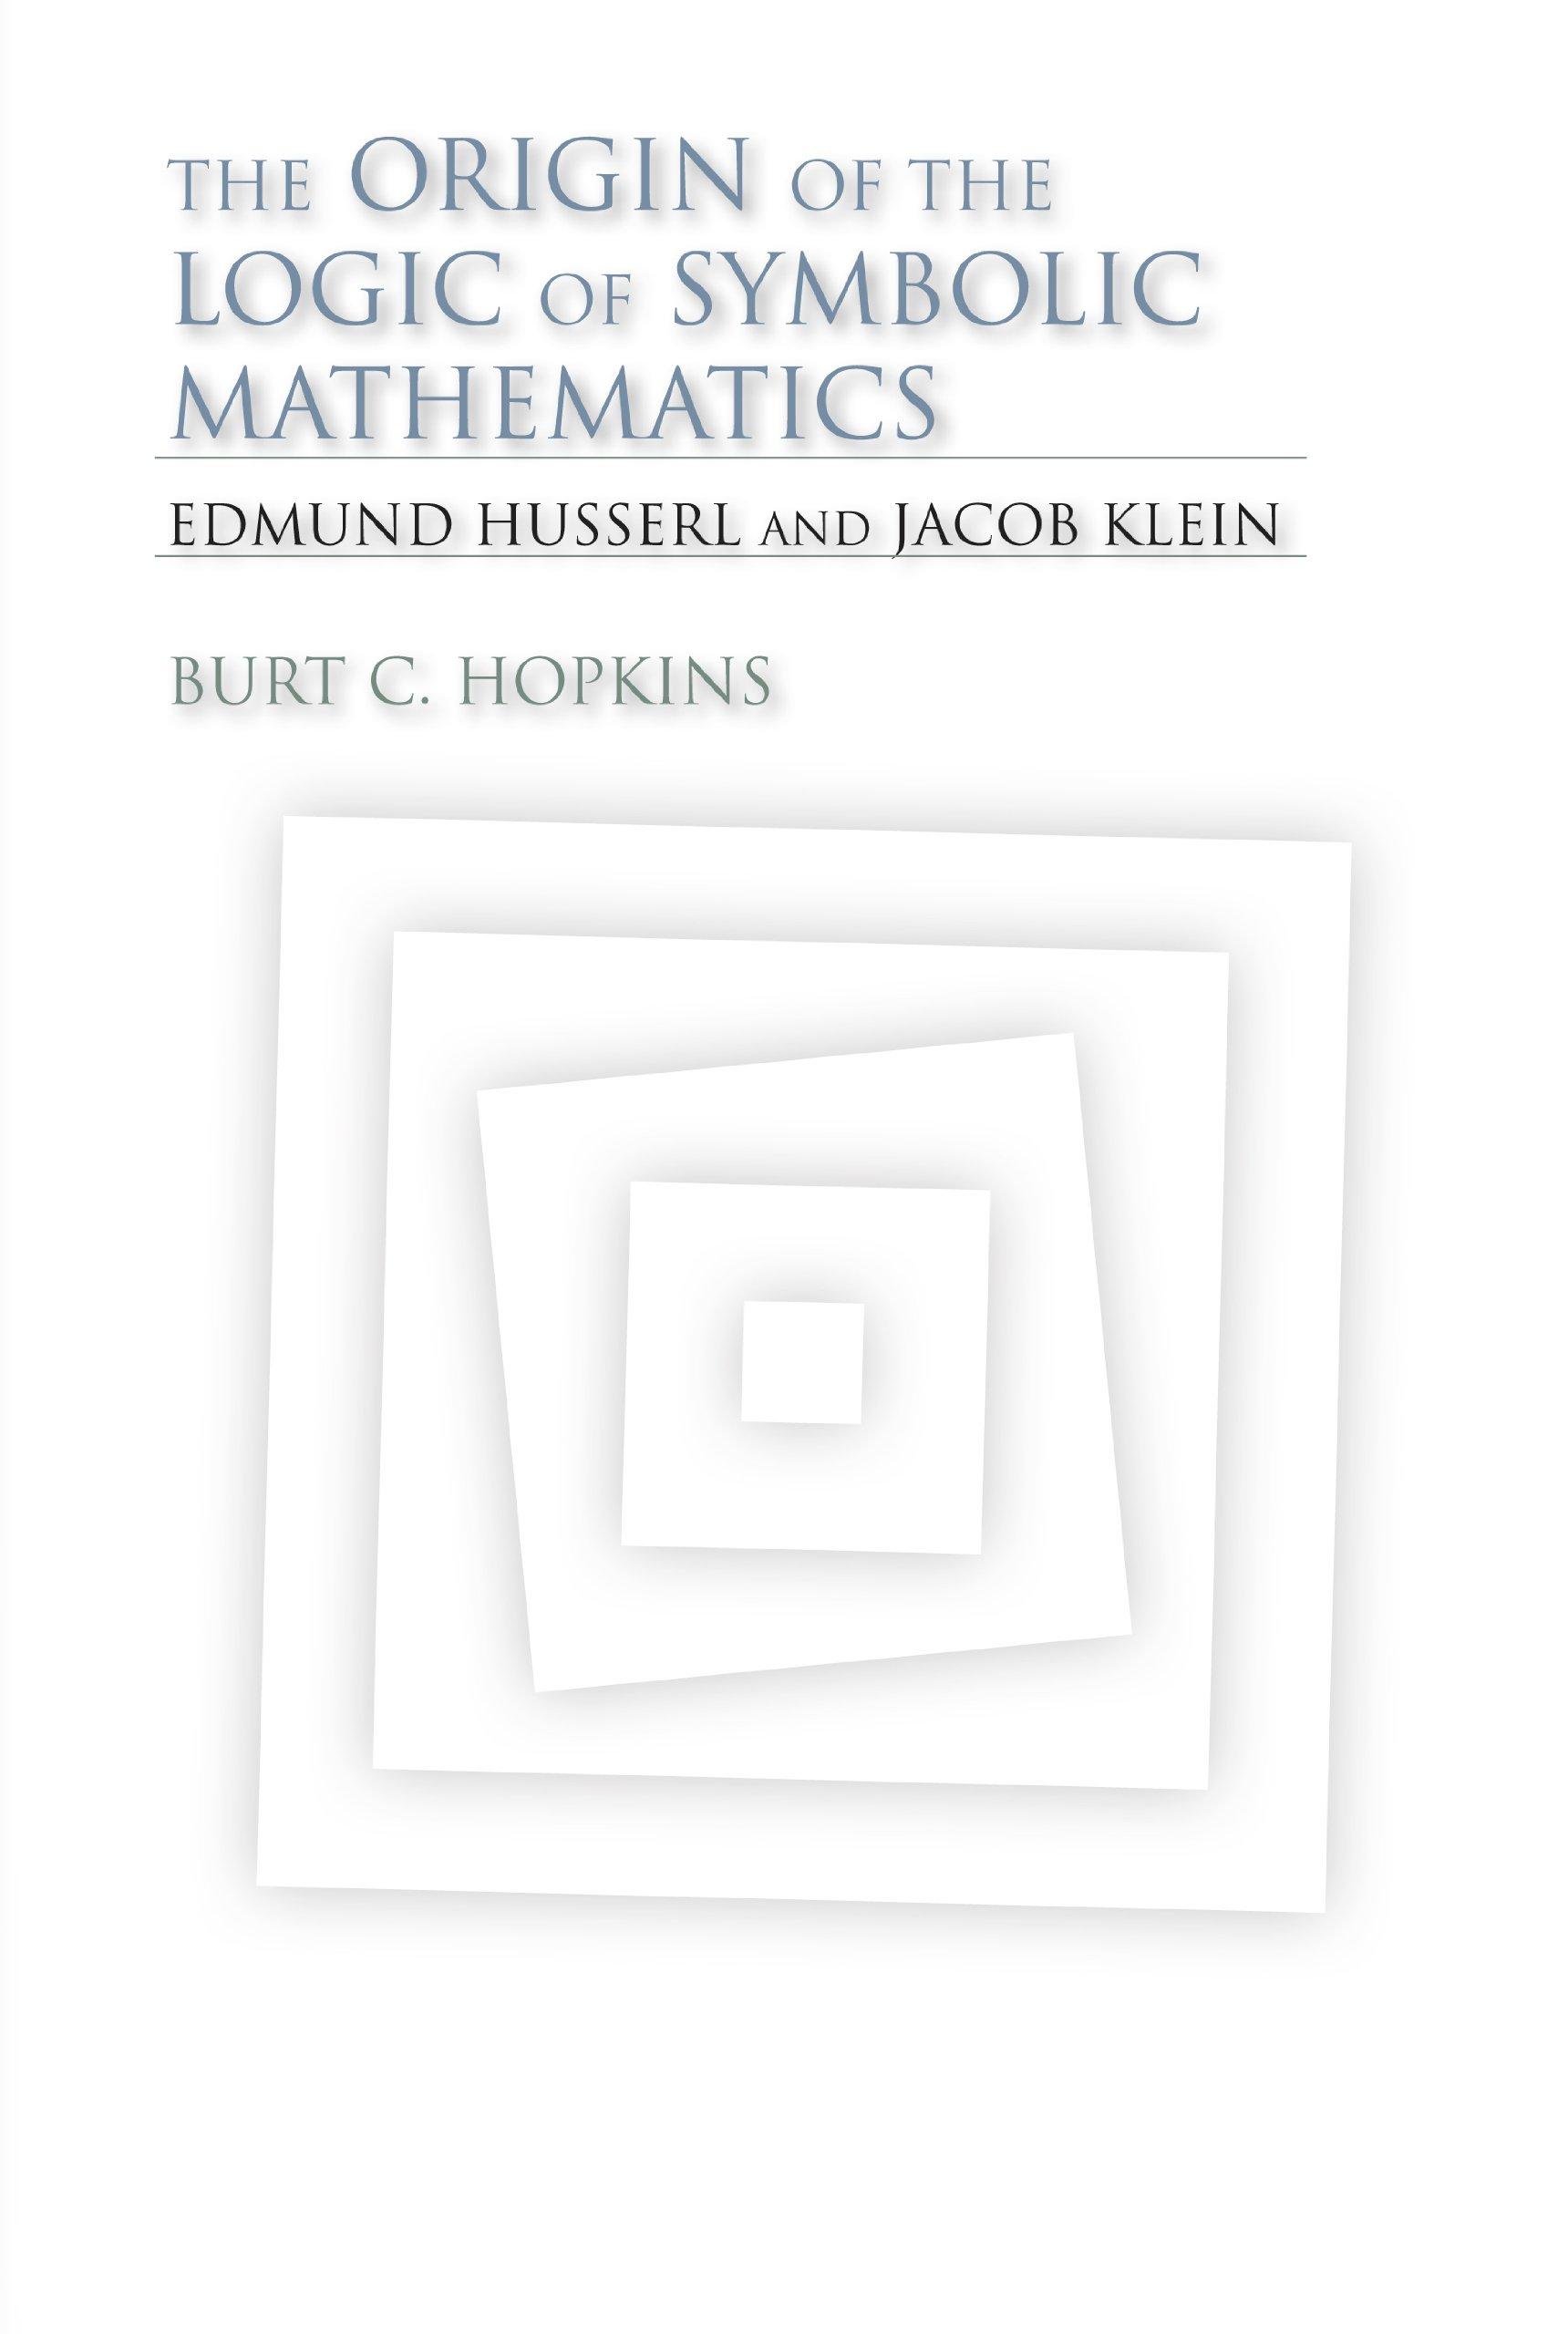 The Origin Of The Logic Of Symbolic Mathematics Edmund Husserl And